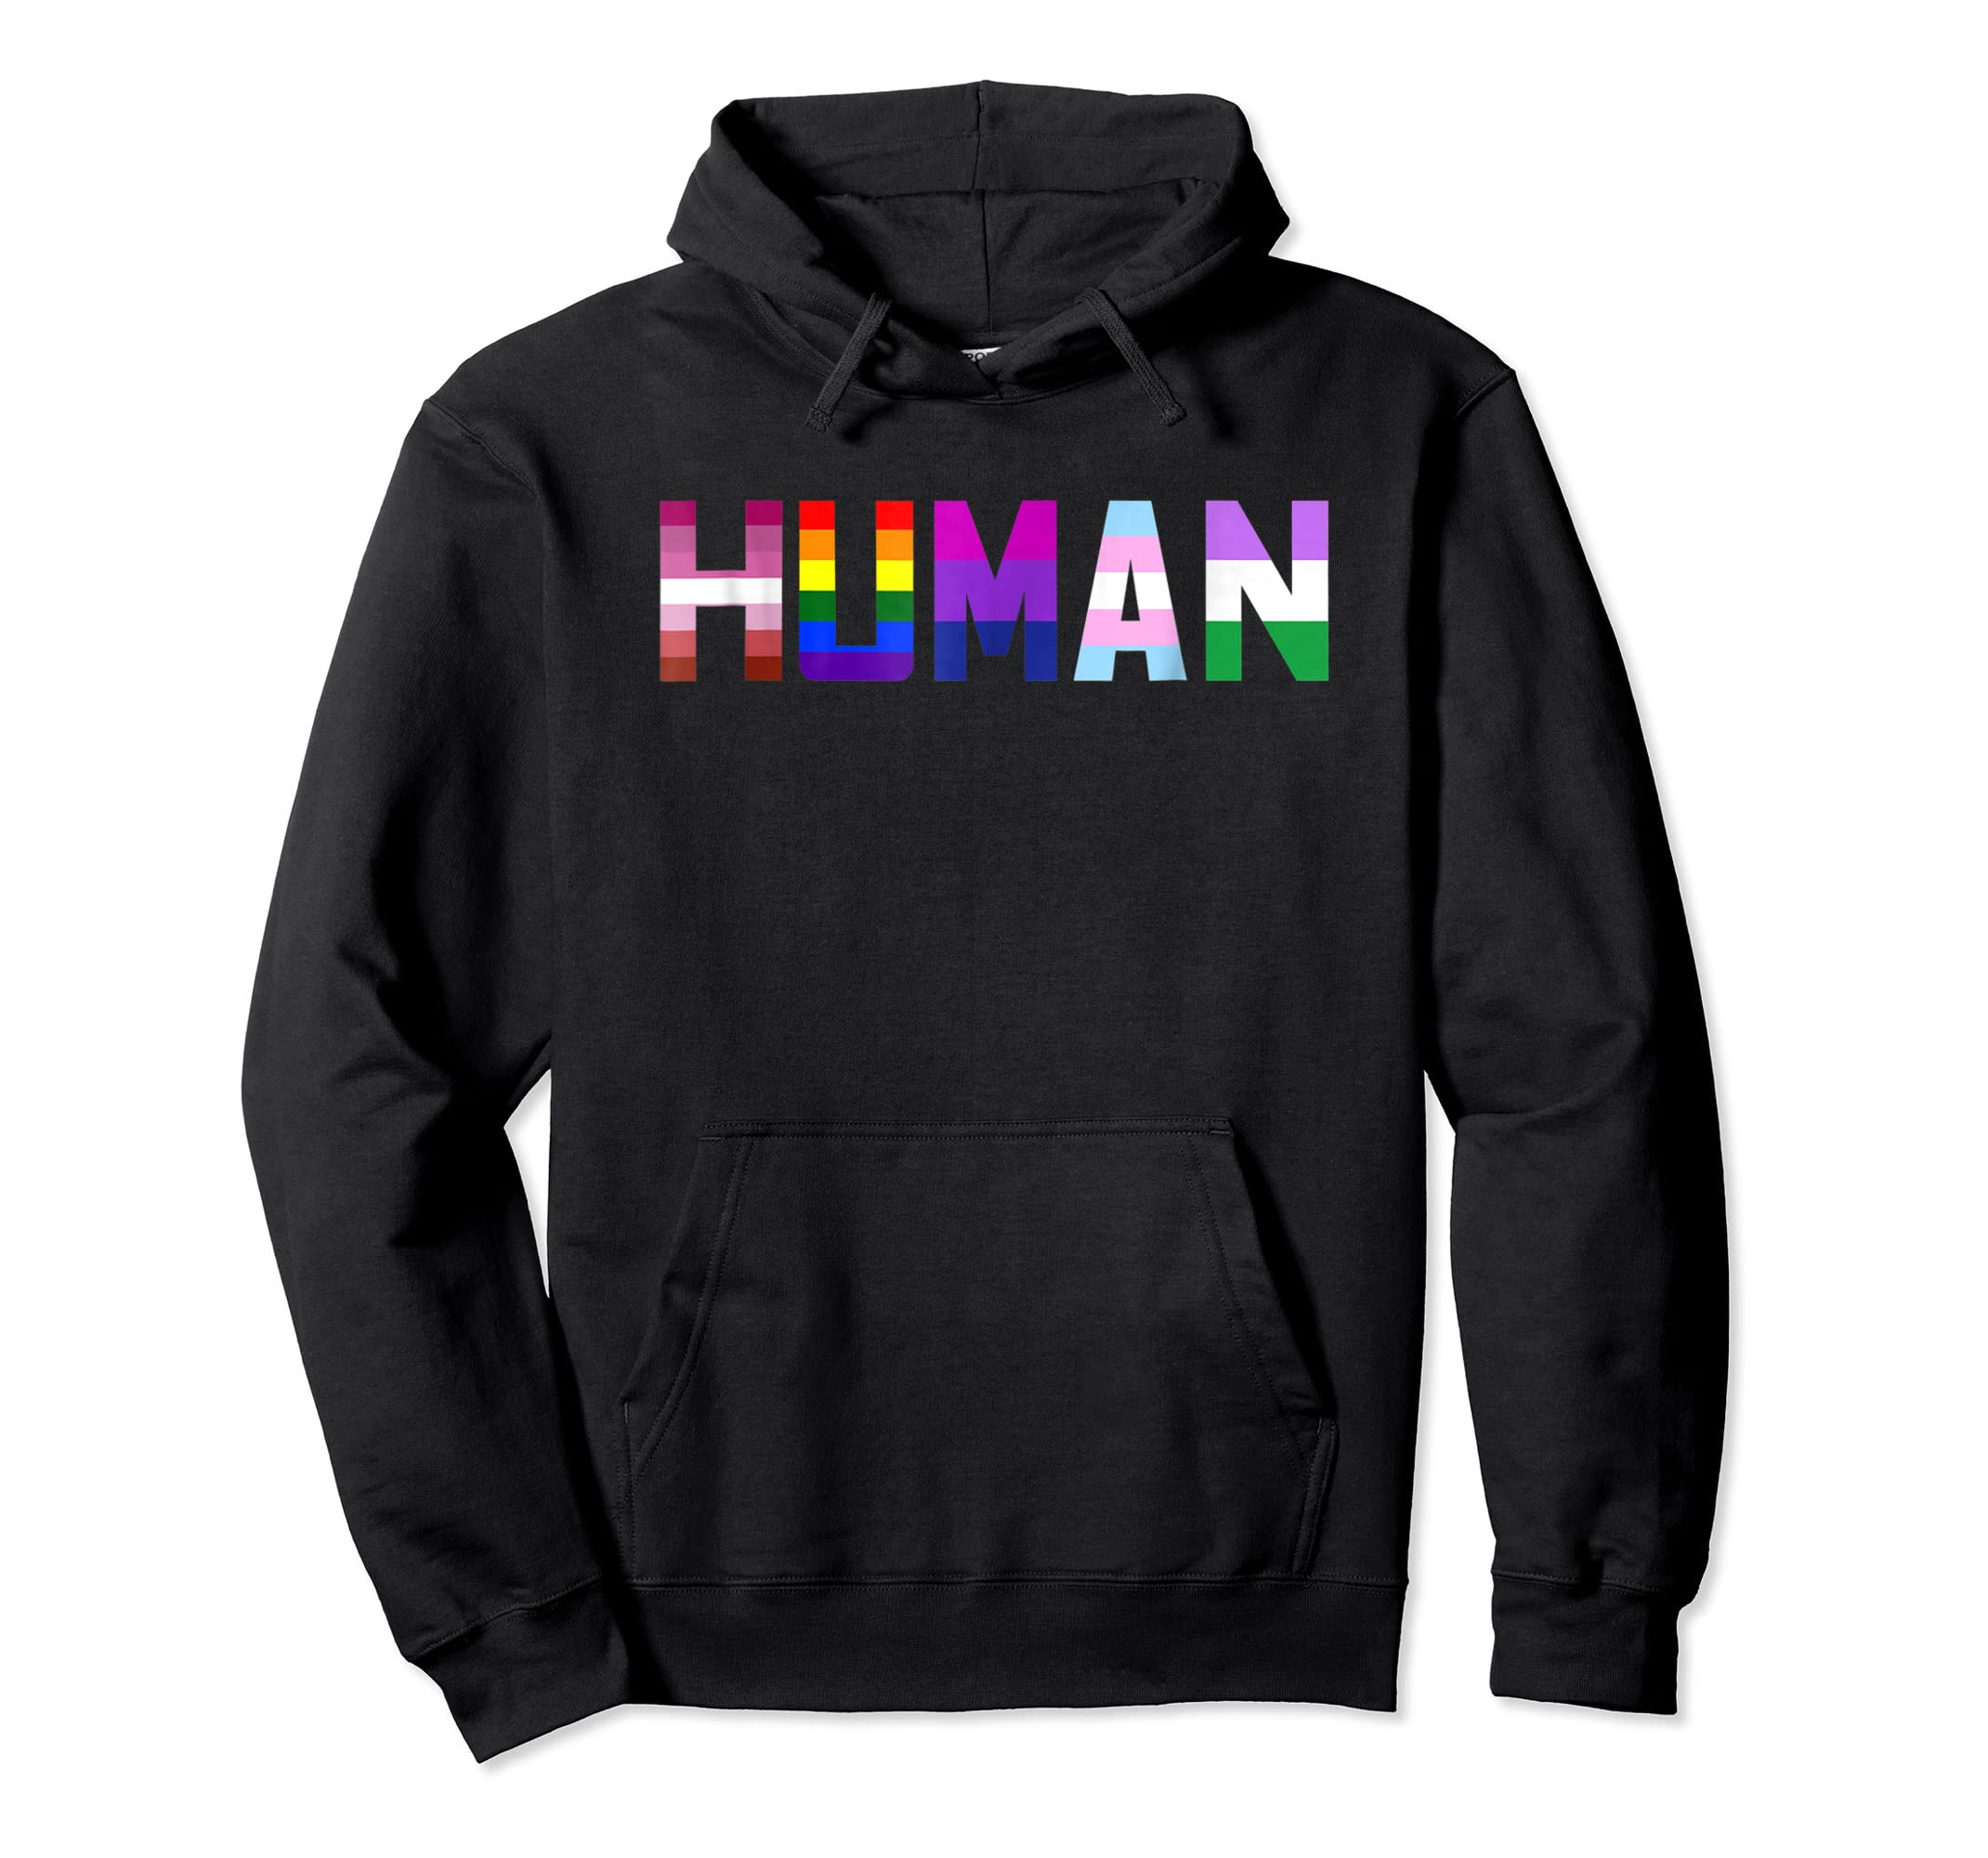 HUMAN Flag LGBT Gay Pride Month Transgender Ally T Shirt-Hoodie-Black